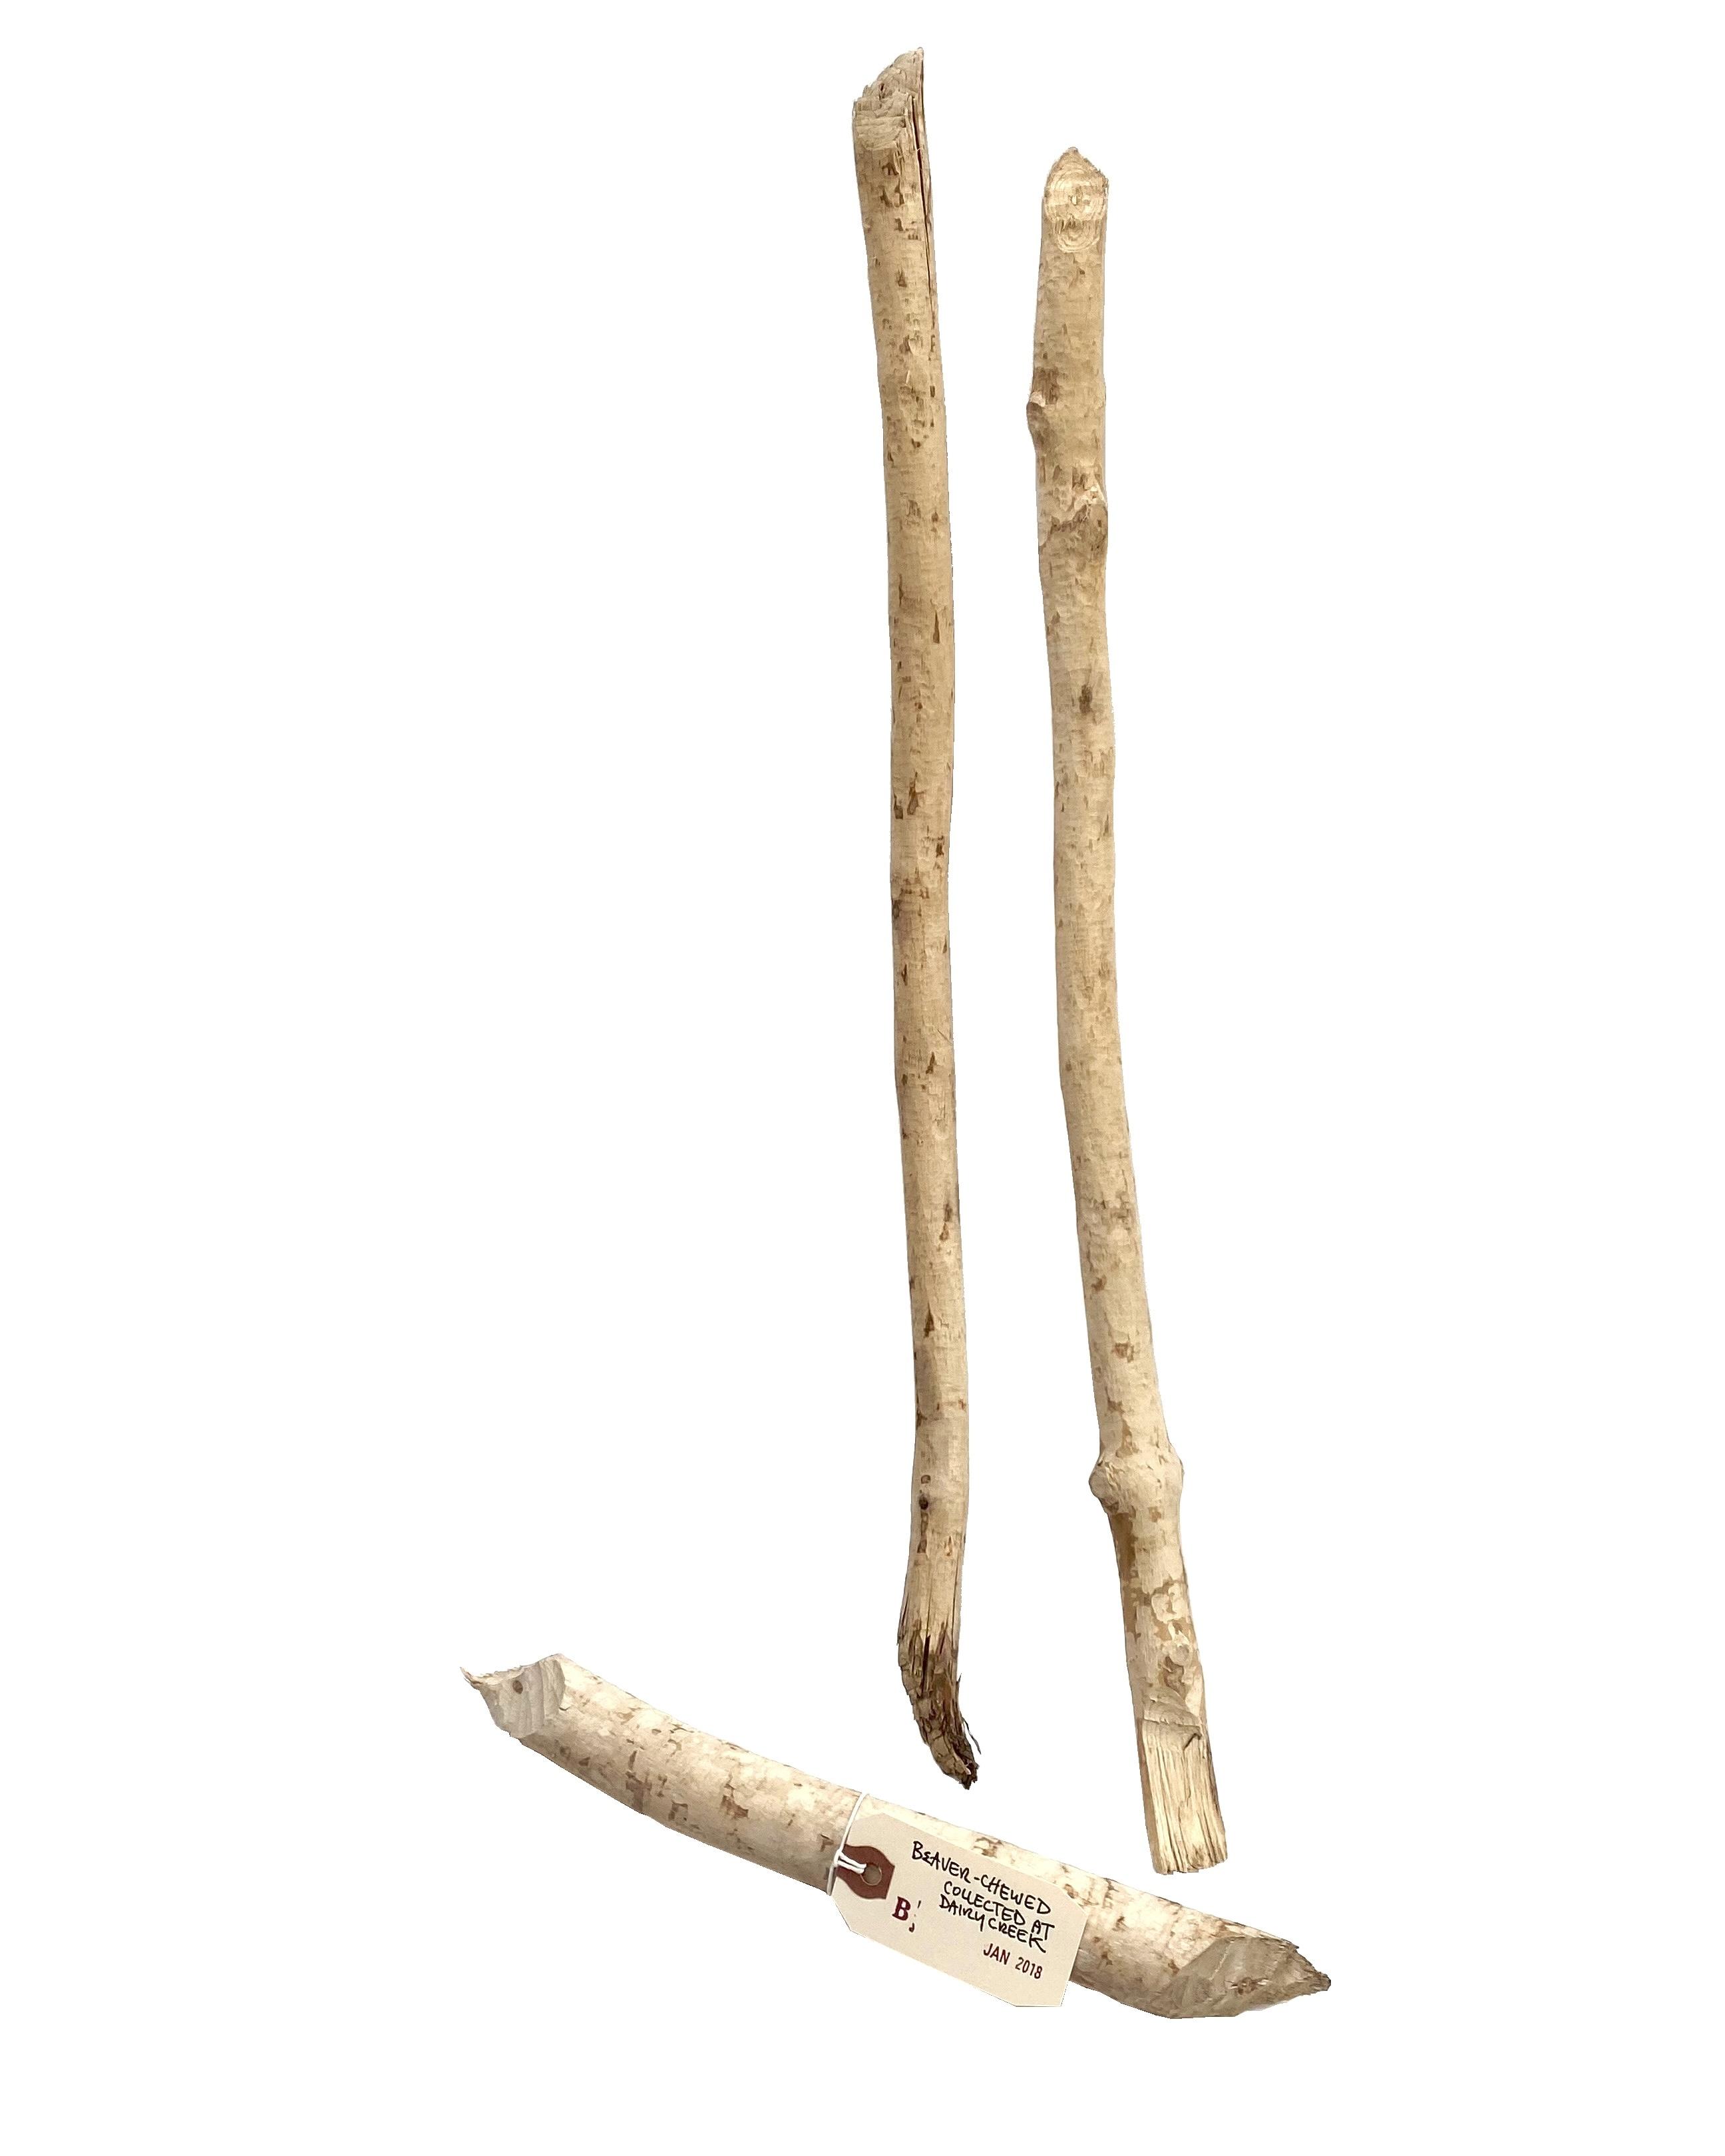 2018 Jan - beaver-chewed sticks